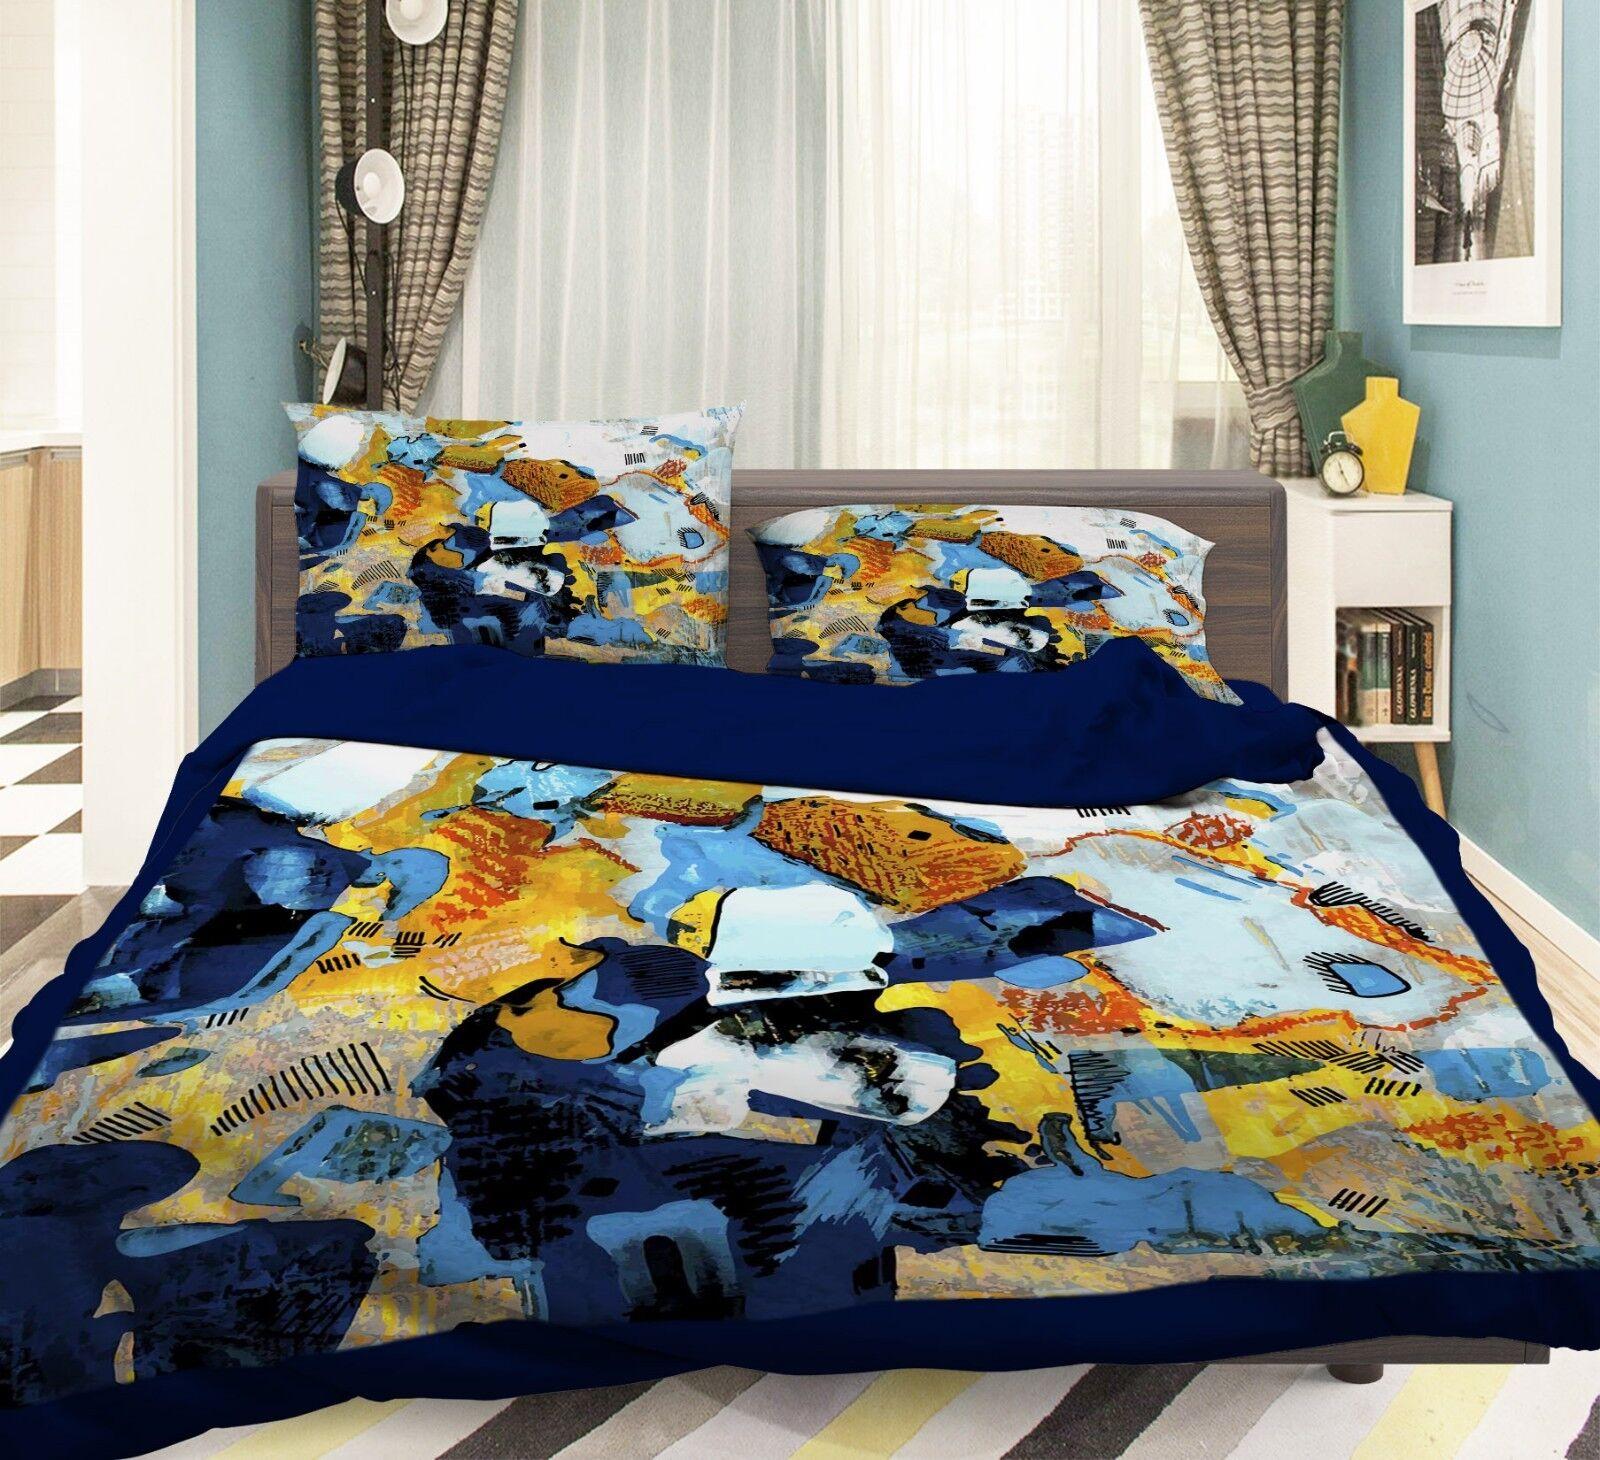 3D Art Graffiti 688 Bed Pillowcases Quilt Duvet Cover Set Single Queen AU Carly